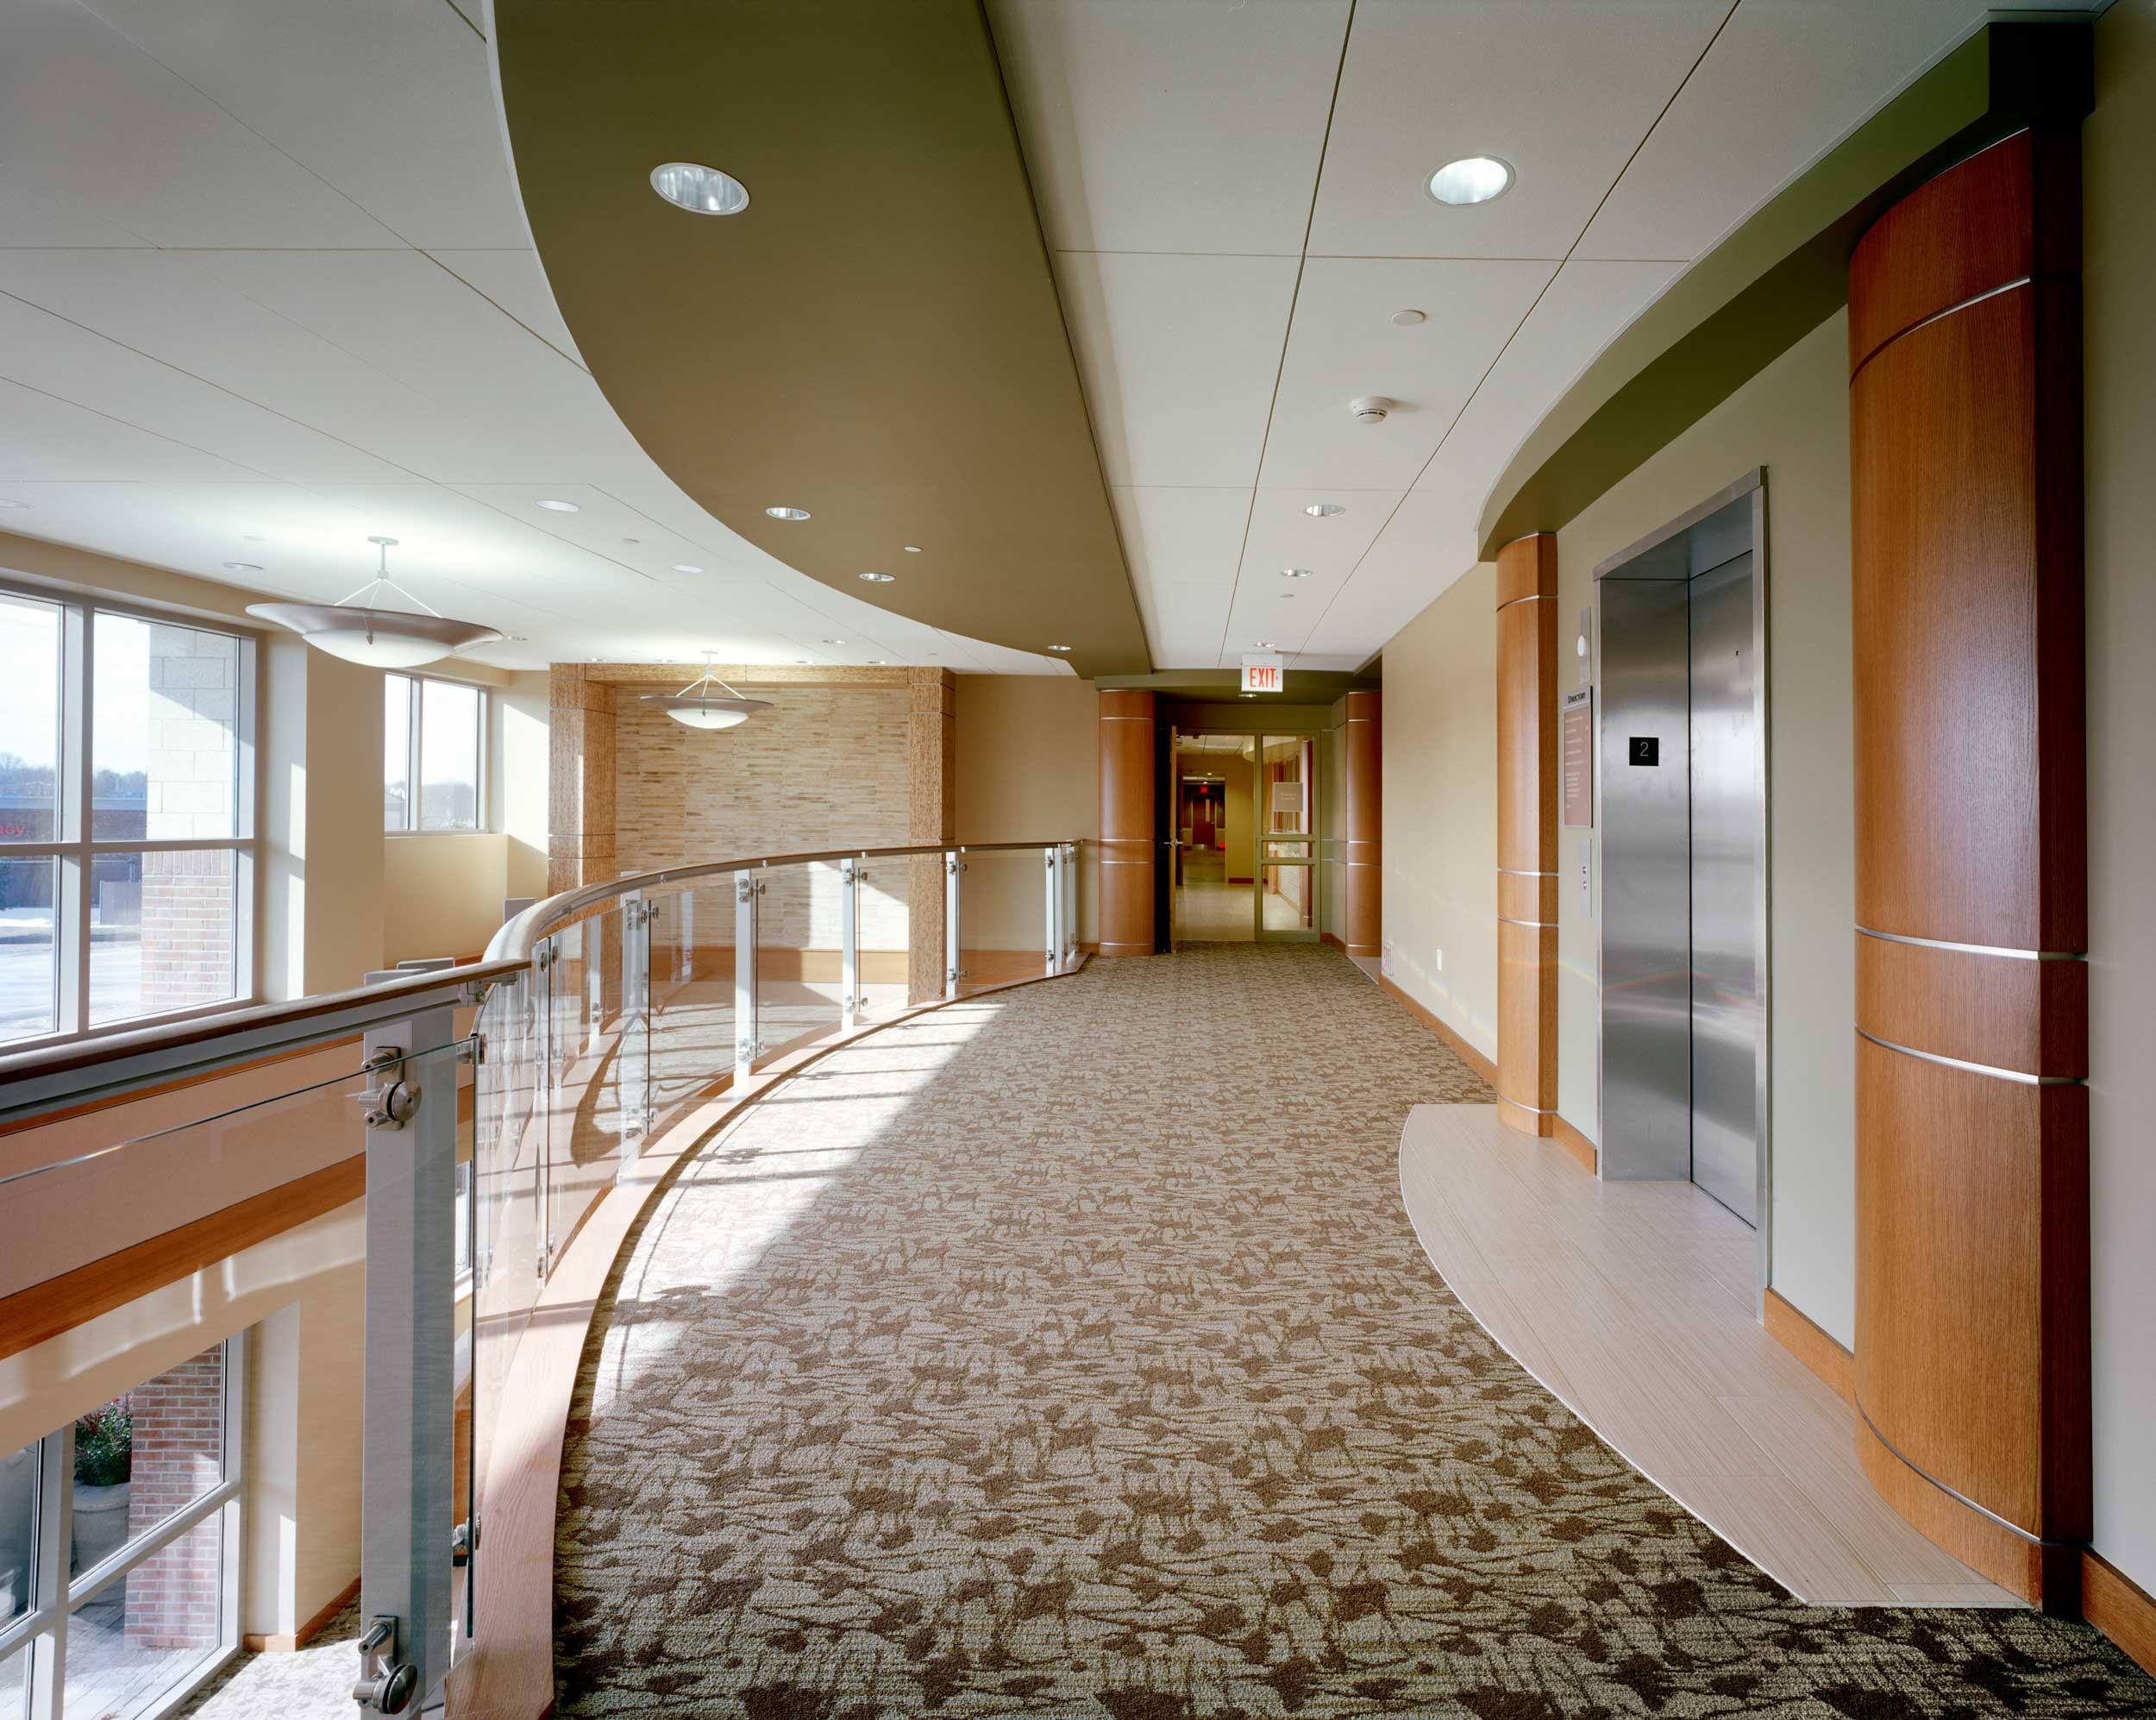 Day Kimball Healthcare & Medical Facility